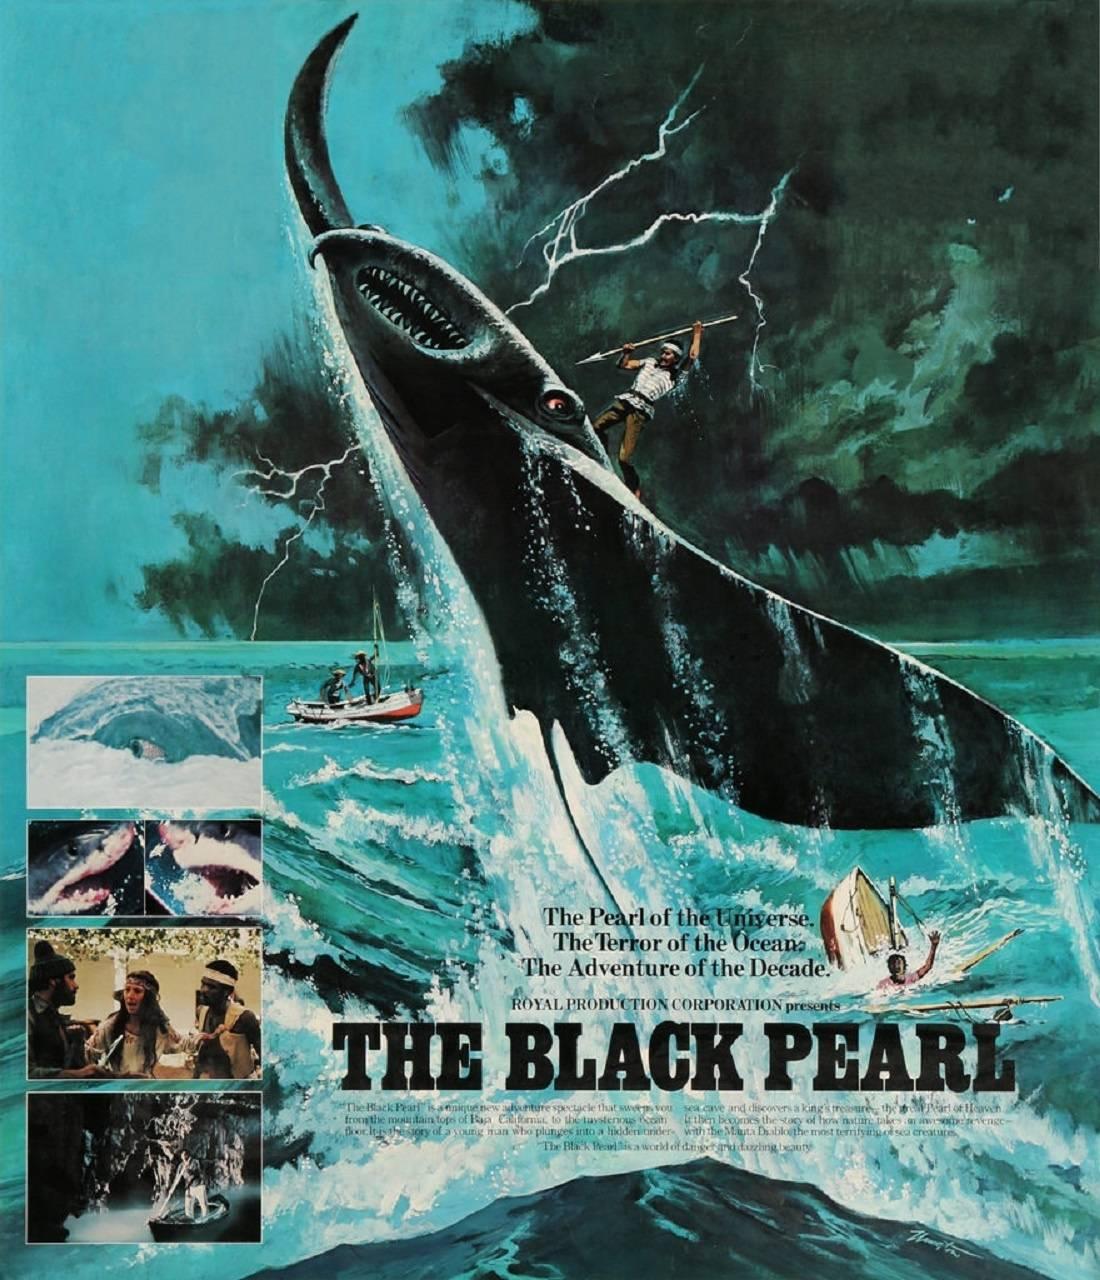 TheBlackPearl Movie